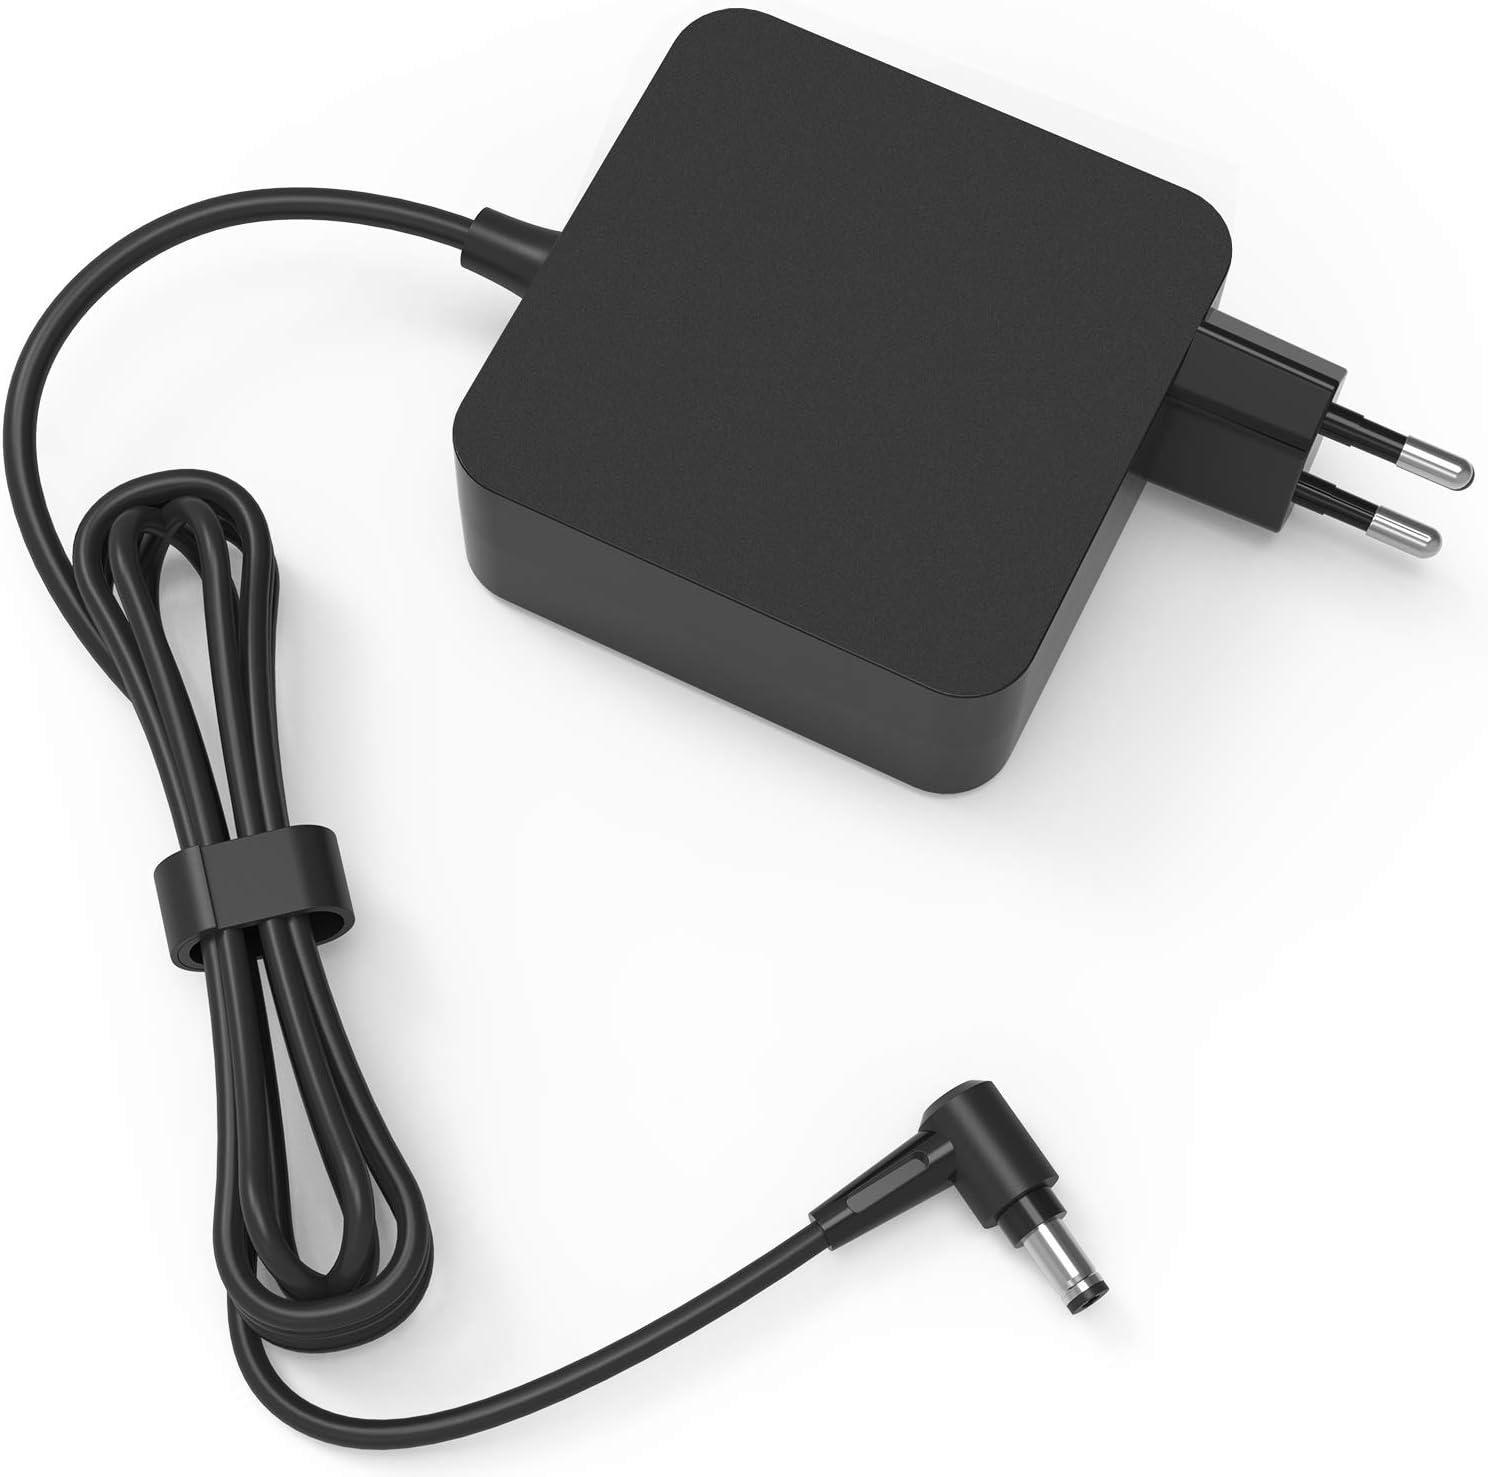 65W cargador de cable de adaptador de fuente de alimentación del portátil para Asus F555 F555L F555LA F555UA F555U F554 F554L F554LA F551CA F551C F551 K551LN K551L K551 K550 K550CA K550C K550LA K550L